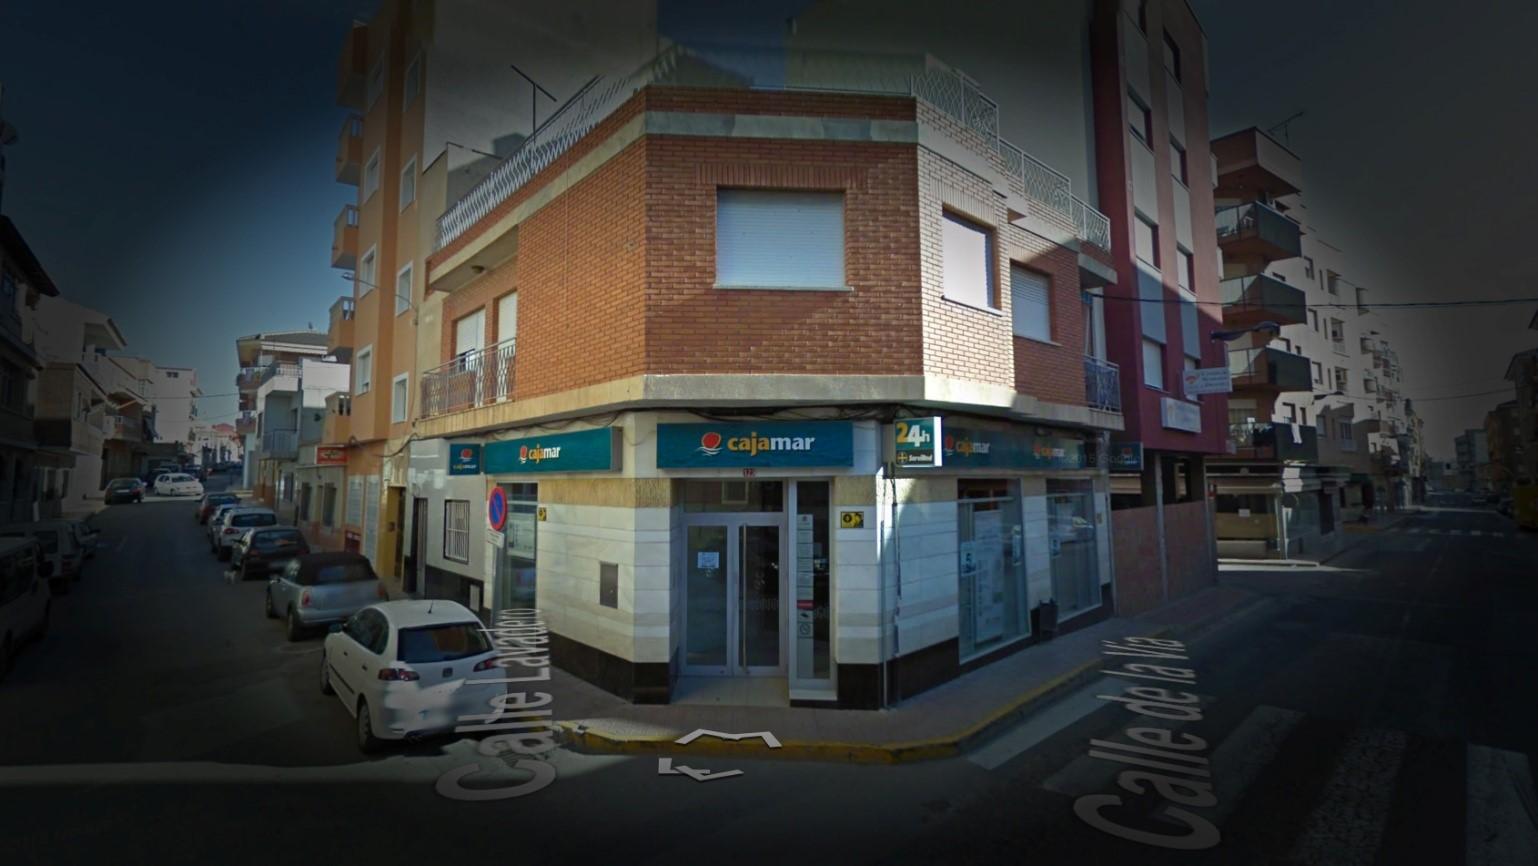 Ugt gcc murcia blog 2015 2019 adi s 307 mazarr n la v a for Oficinas cajamar murcia